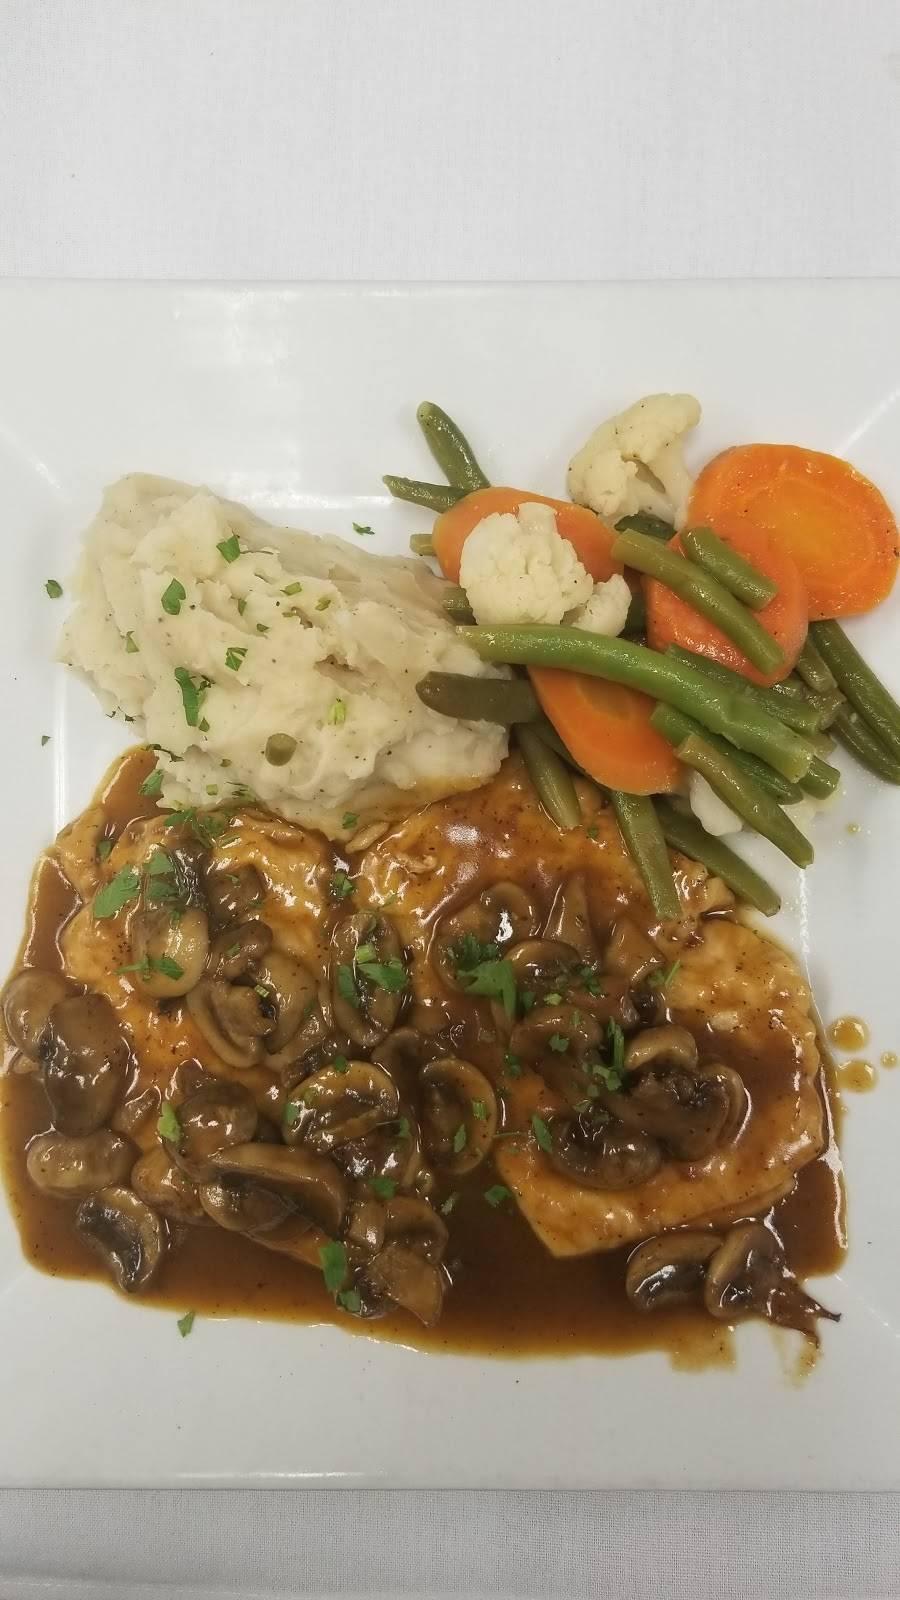 Trillos 15X | restaurant | Xchange Retail Shops, 1002 Riverside Station Blvd, Secaucus, NJ 07094, USA | 2017063178 OR +1 201-706-3178